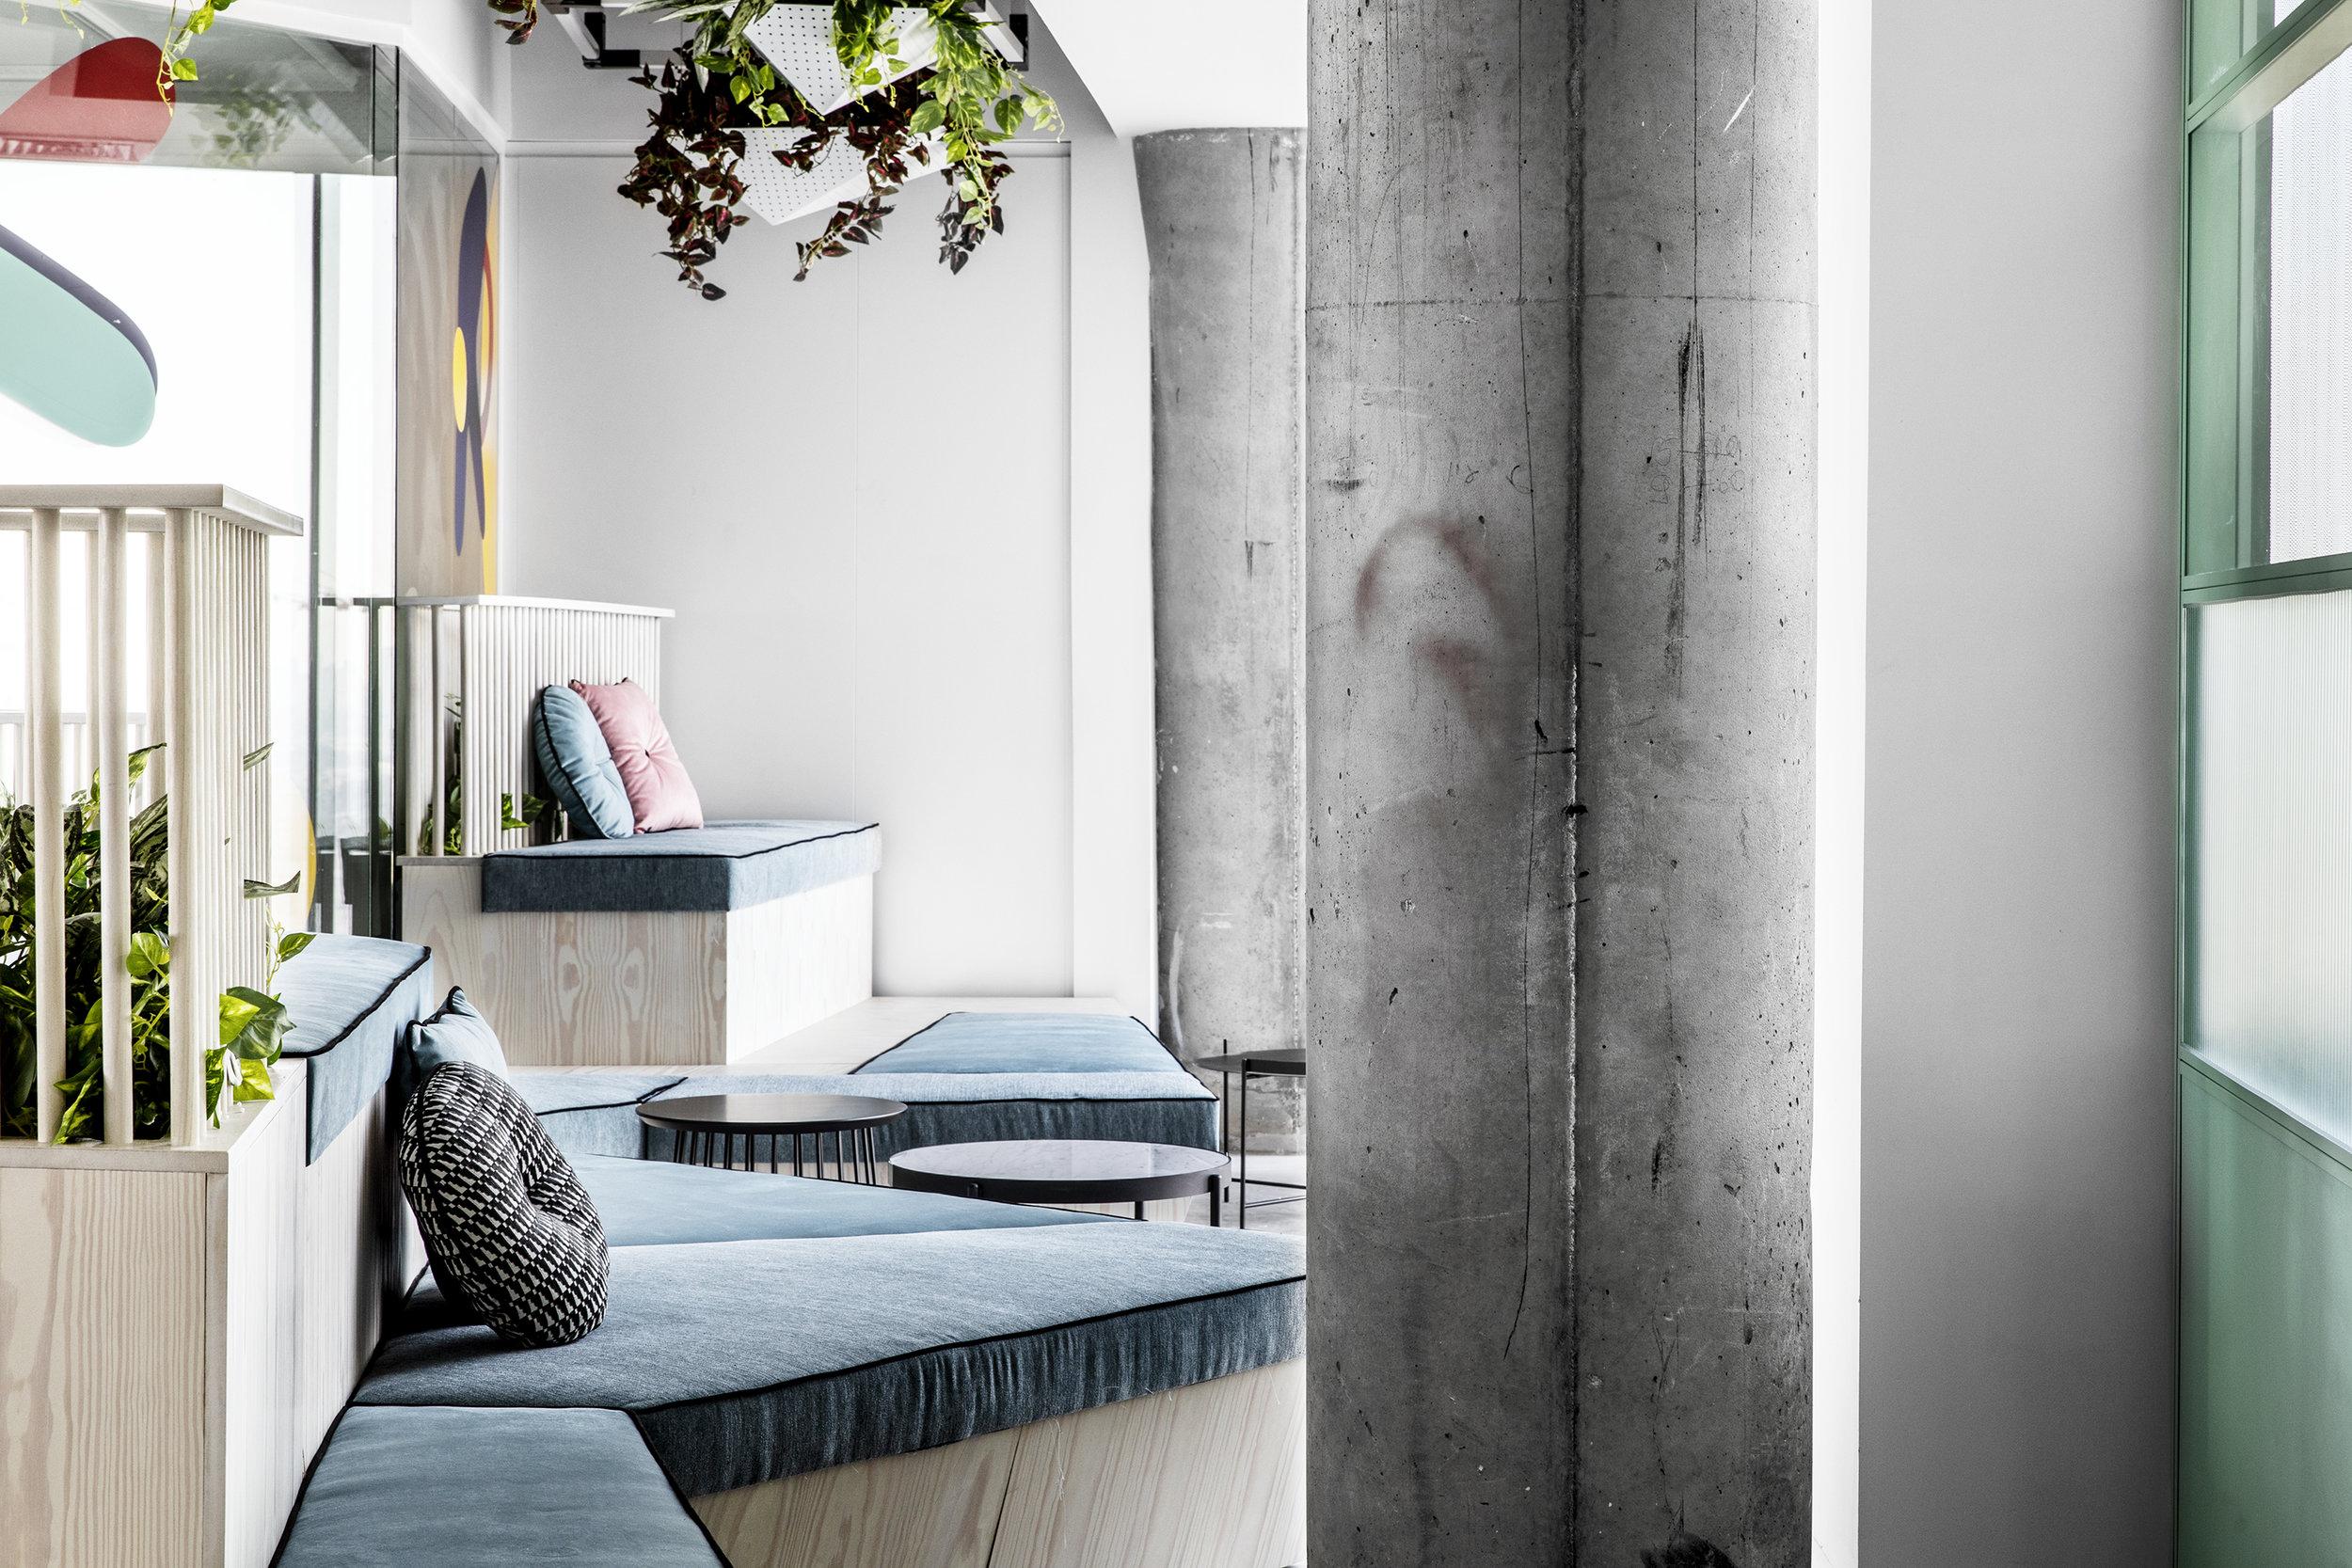 רואי דוד אדריכלות - אדריכל - נטורל אינטליג'נס - ROY DAVID - ARCHITECTURE - ARCHITECT - NI (92).jpg